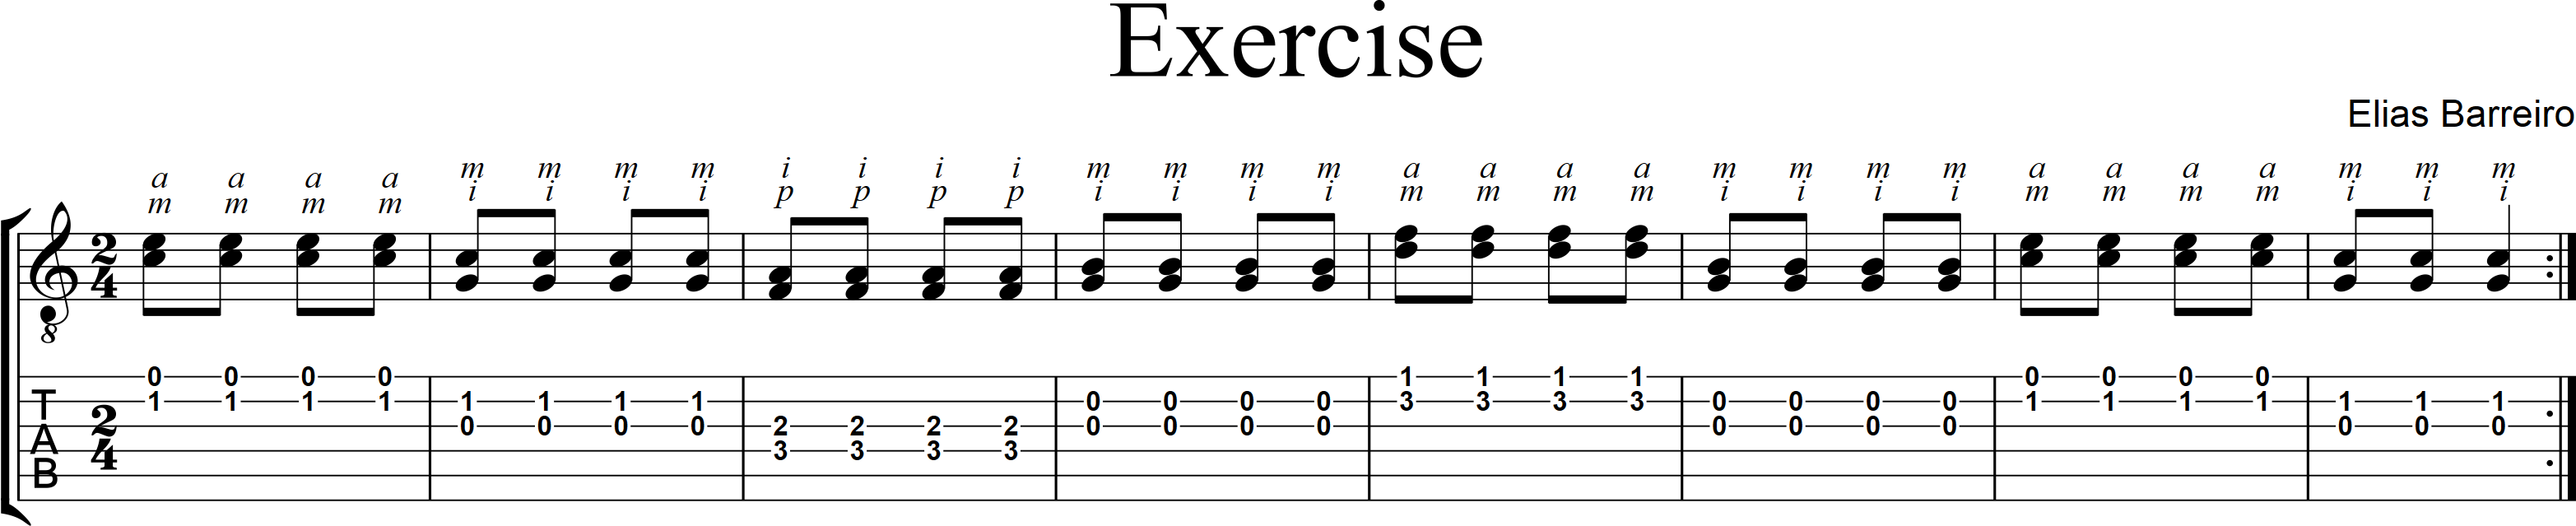 Exercise in C - Elias Barriero